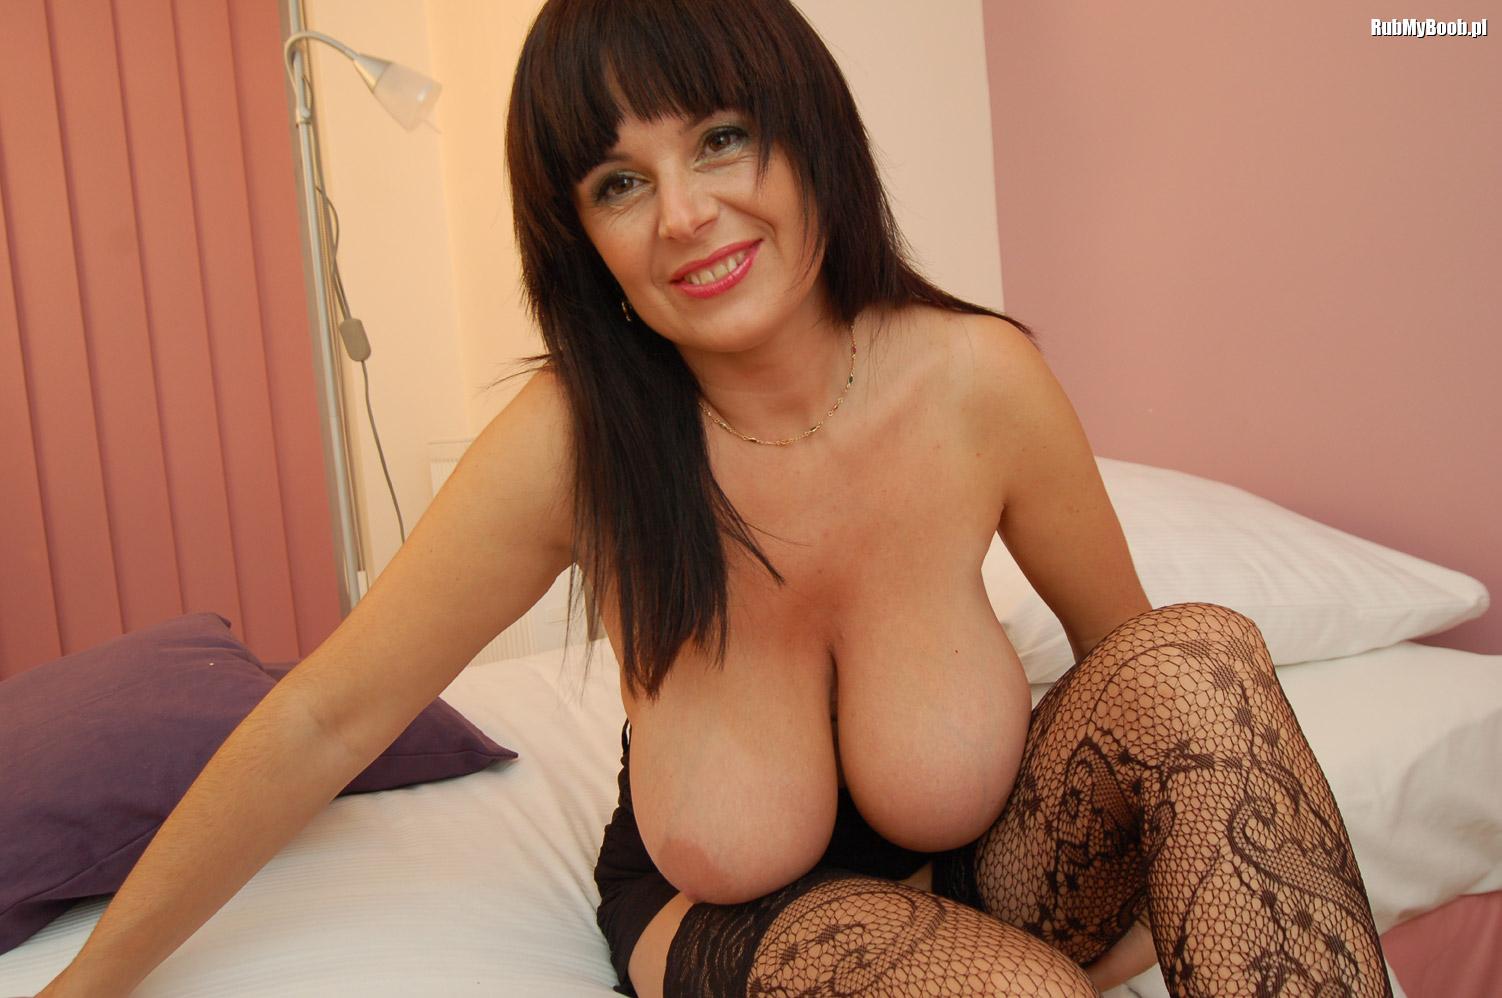 Big Tit Polish Busty 68